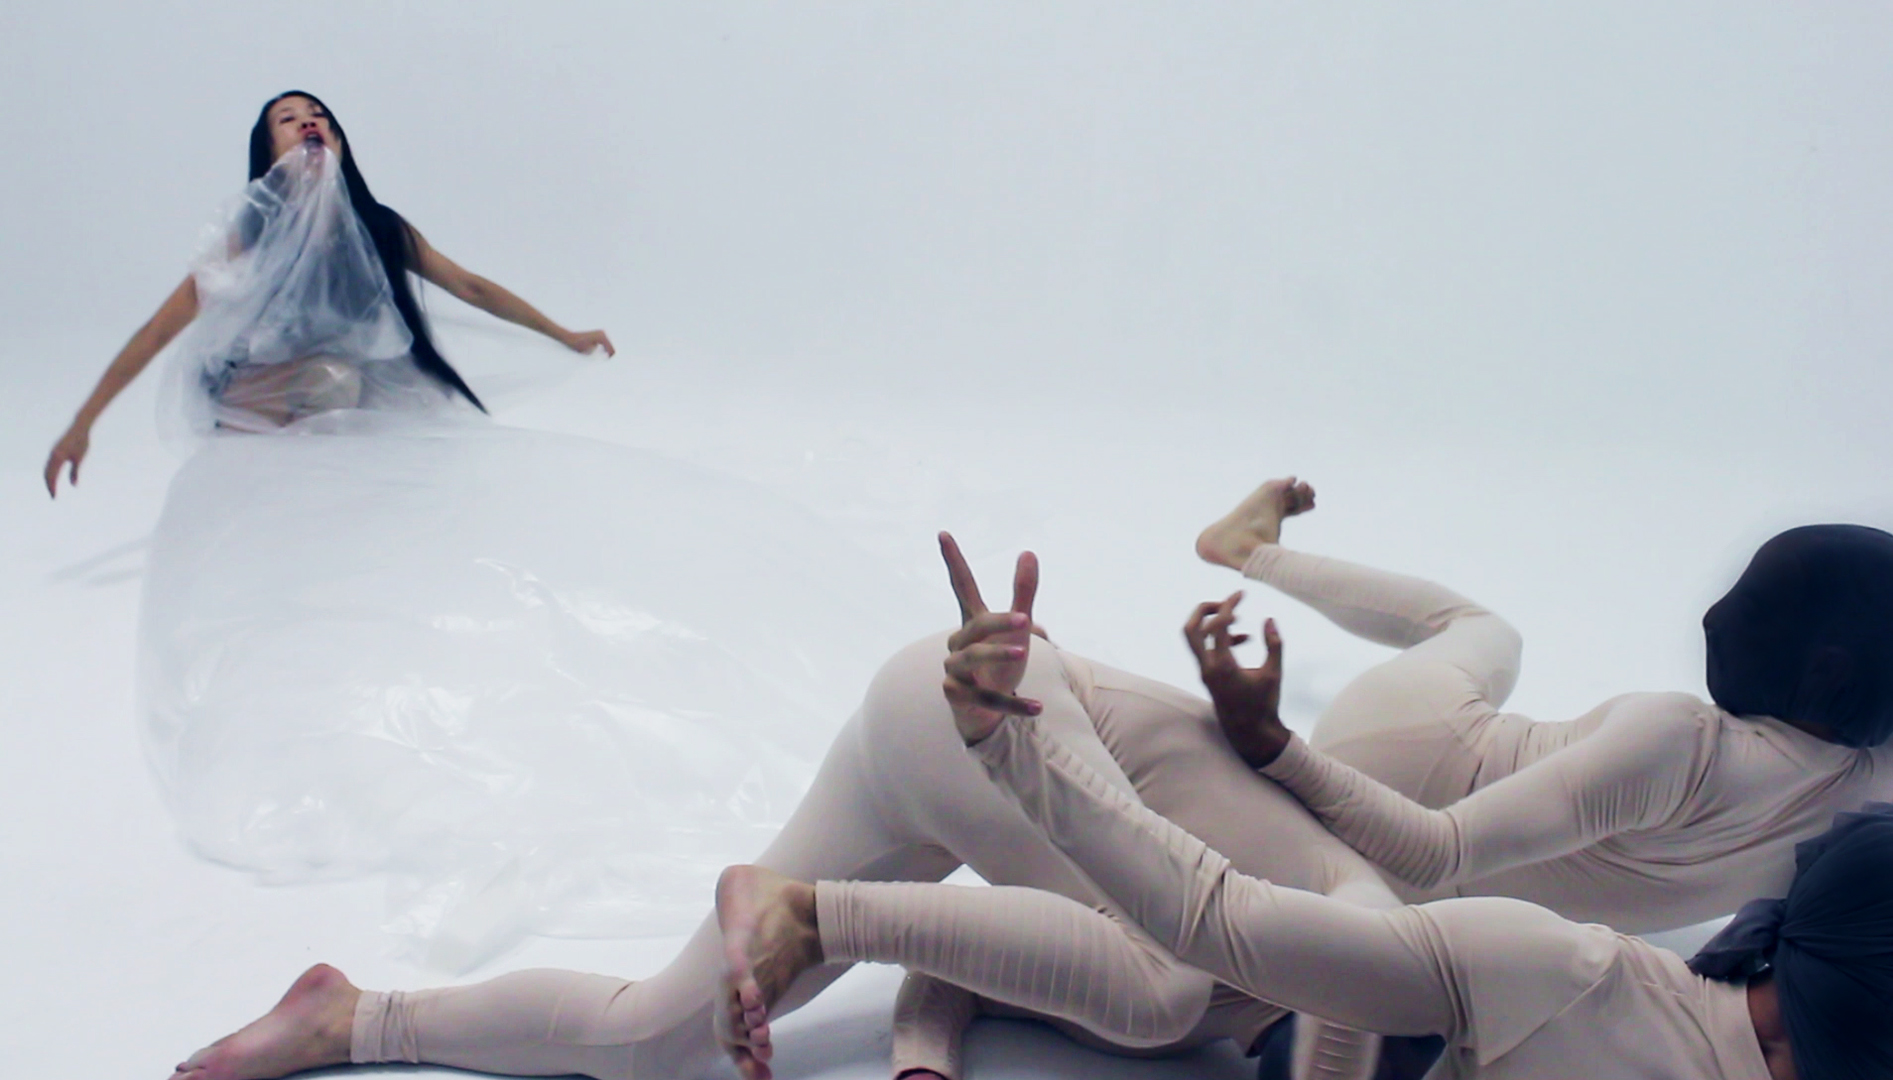 Vrli novi svet/ Photo: Emilio Tenorio